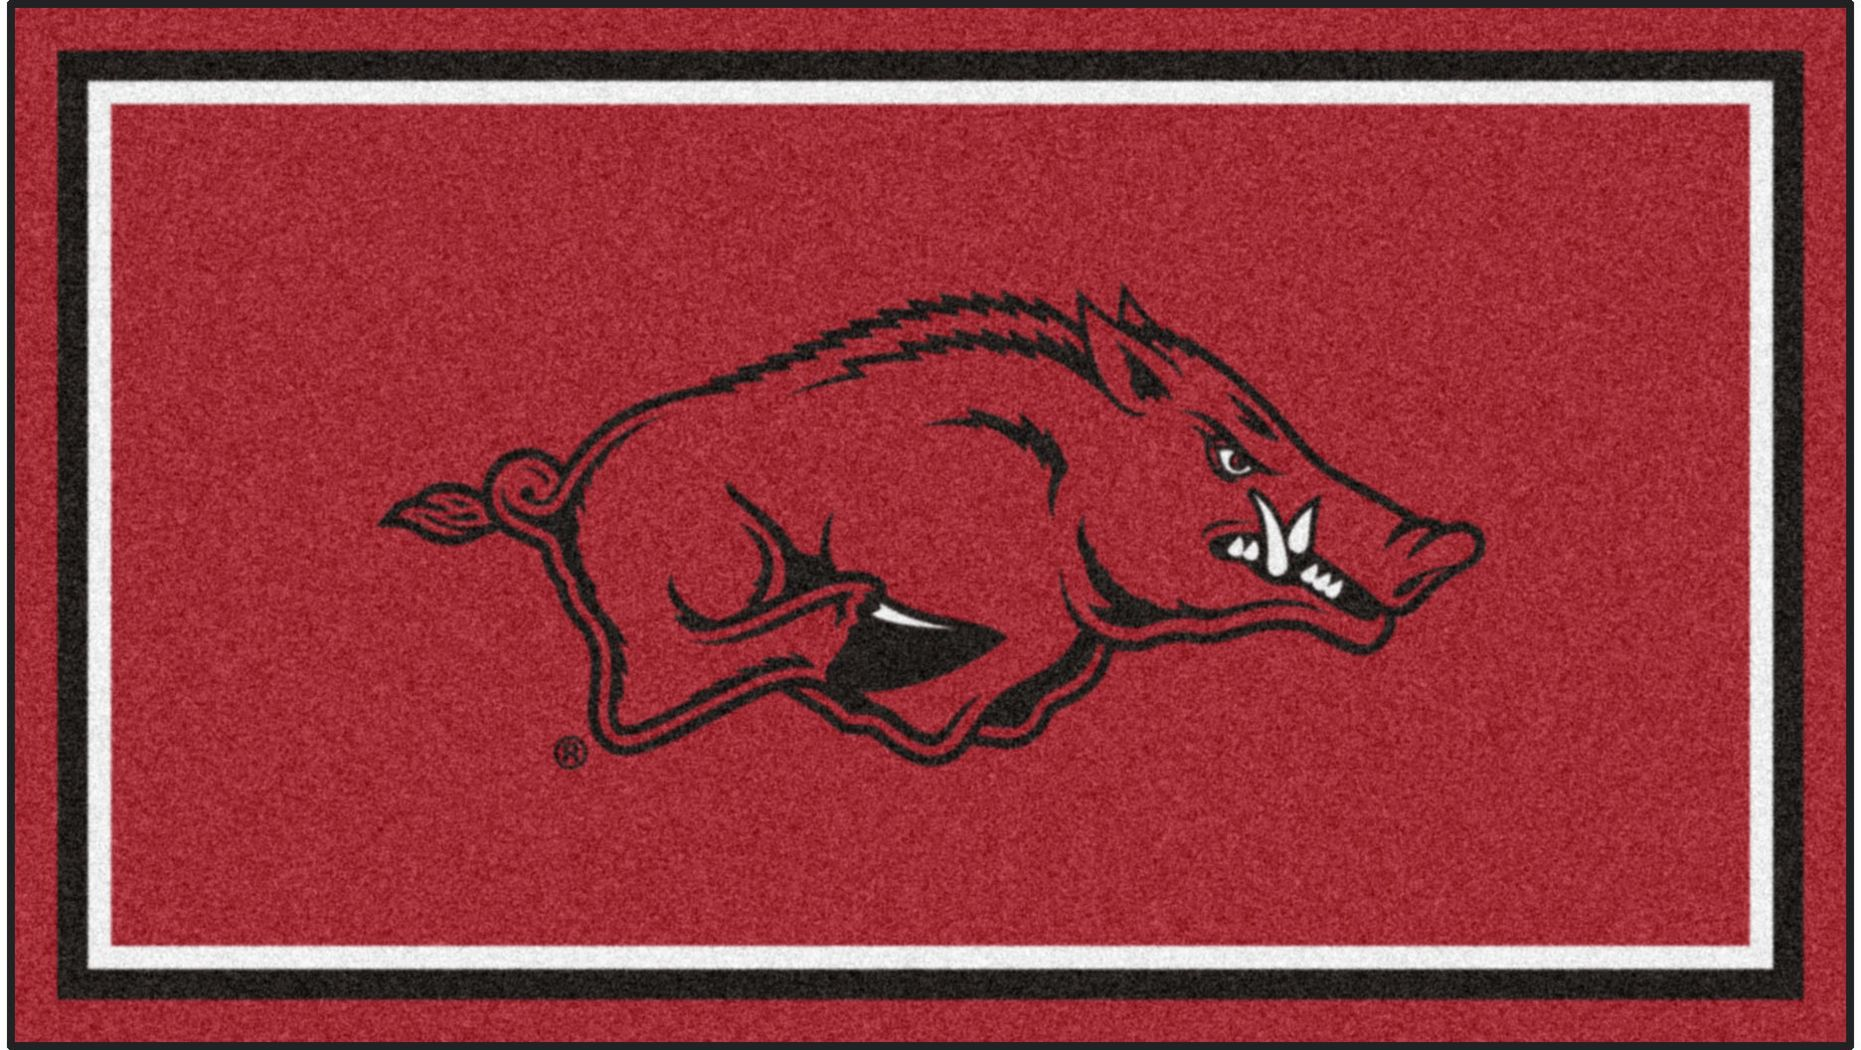 NCAA Big Game University of Arkansas 3' x 5' Rug